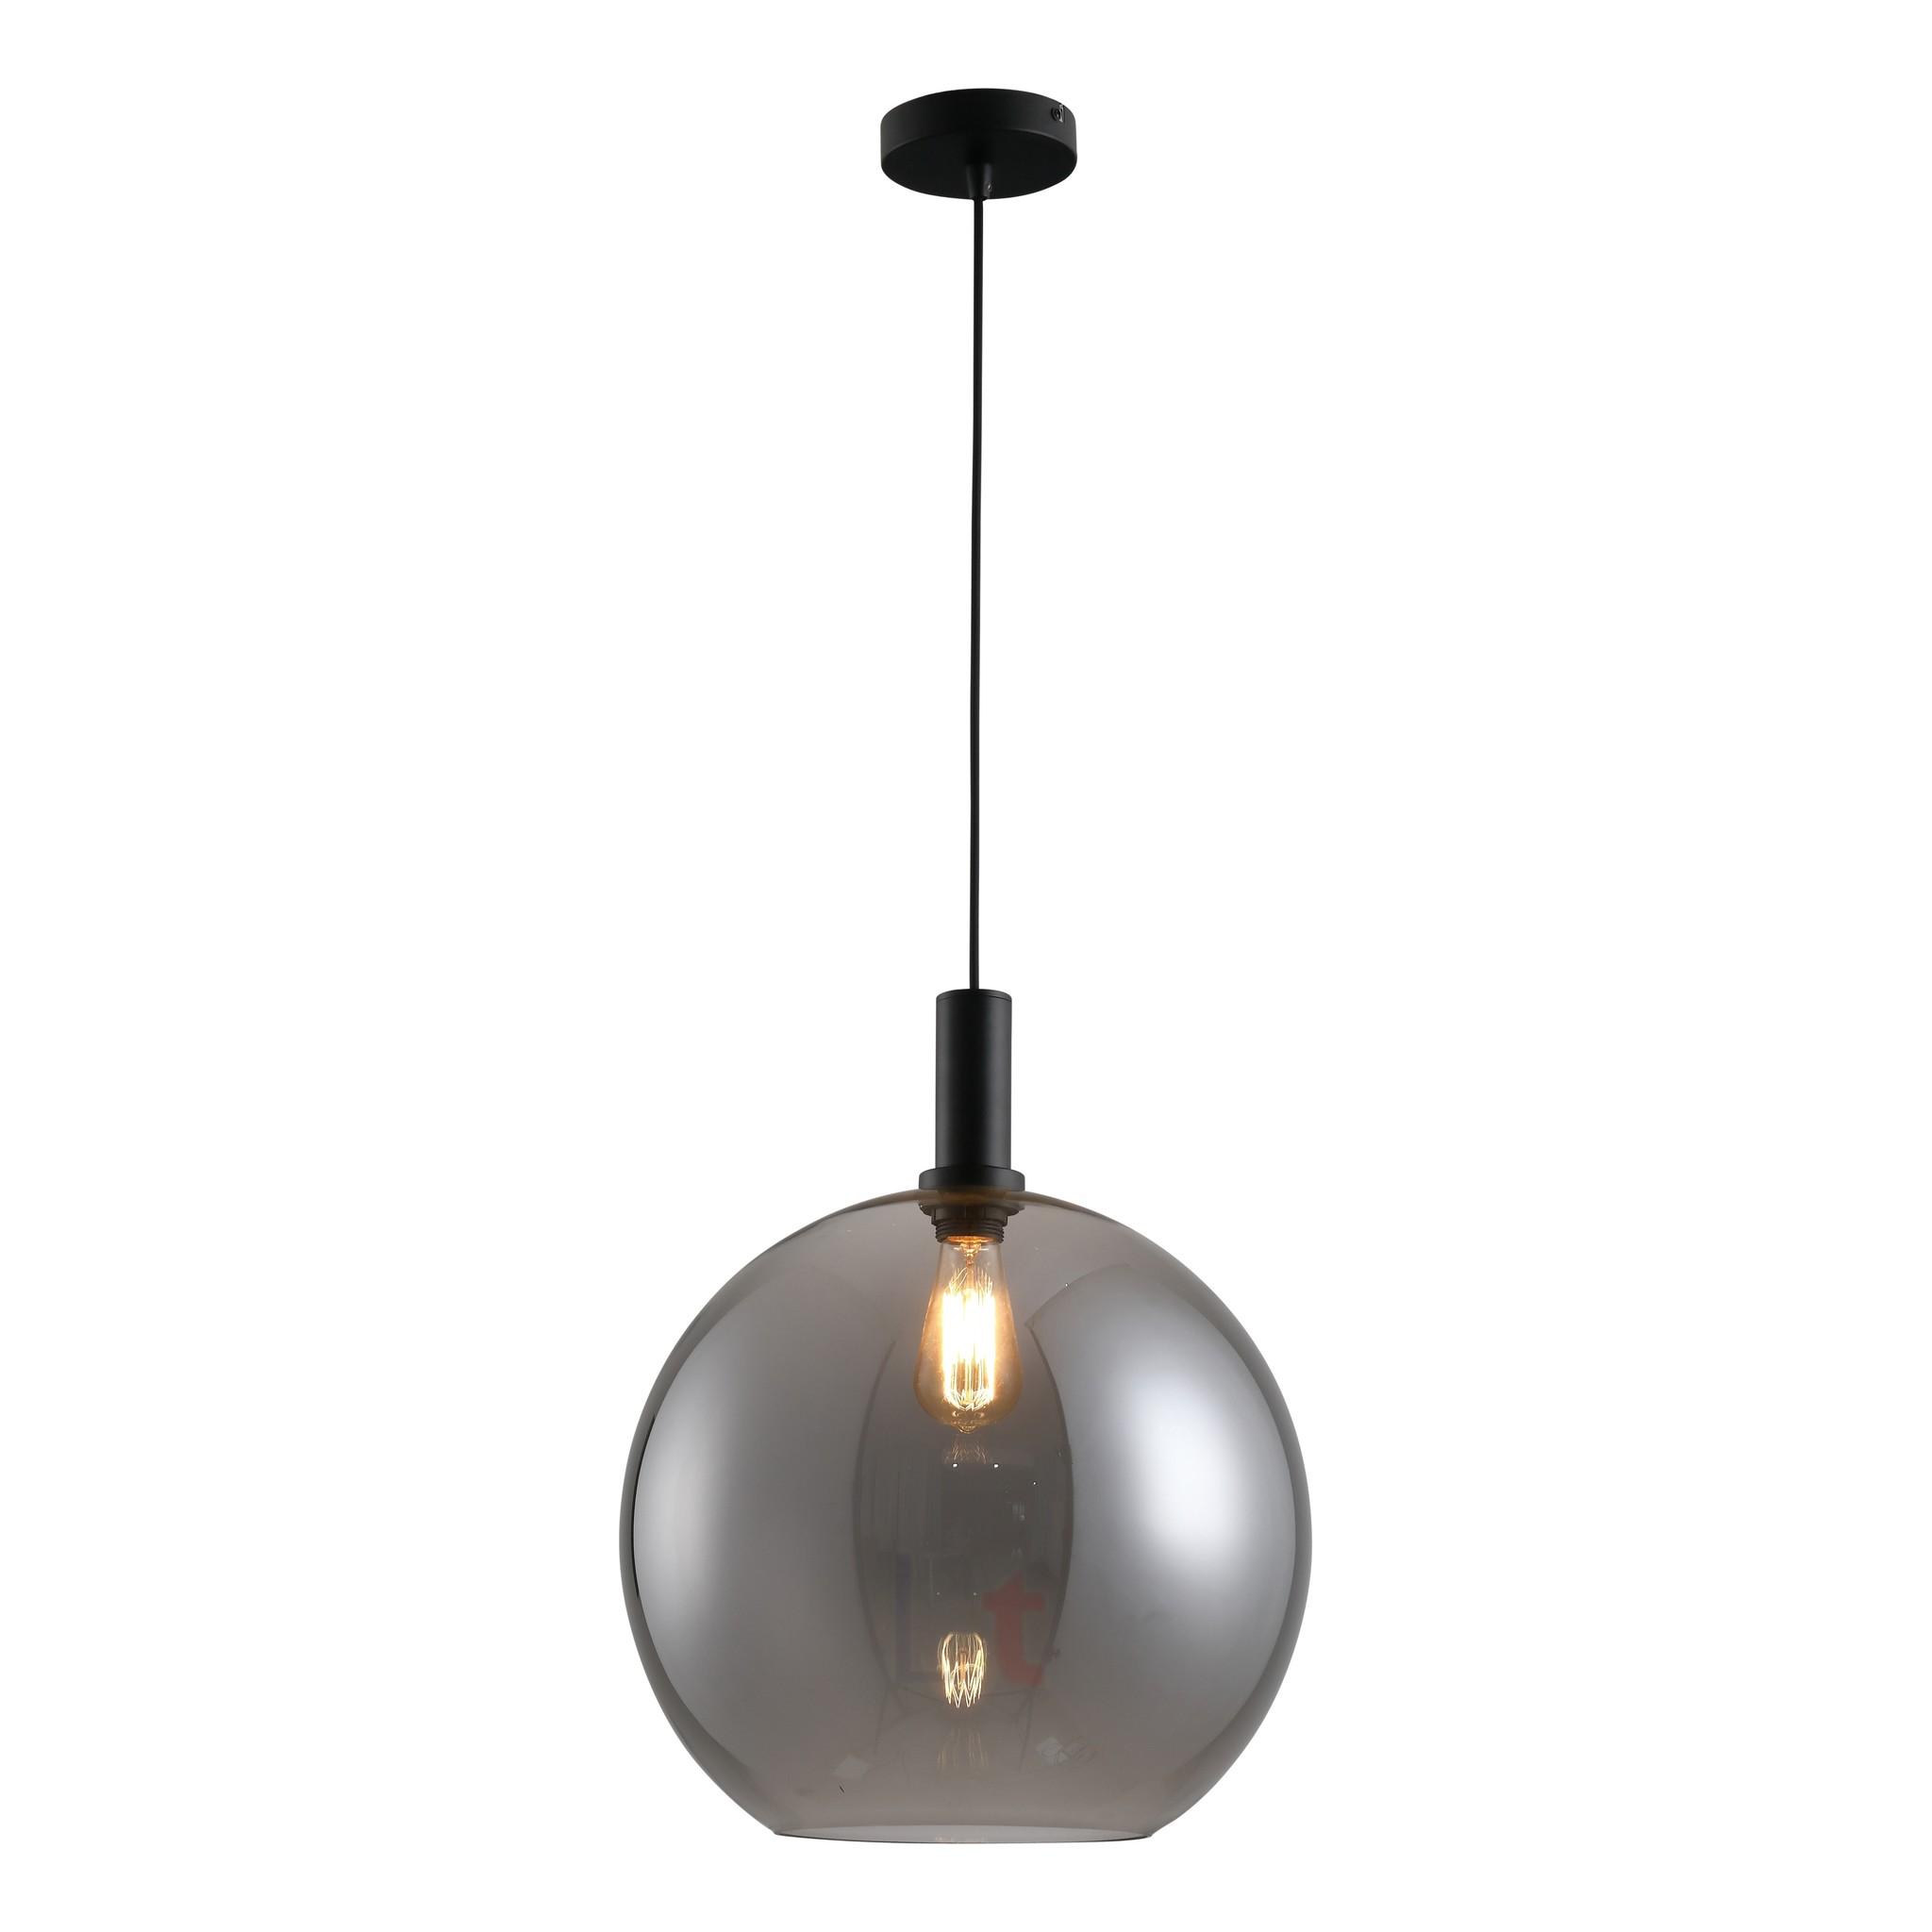 Hanglamp Chandra Smoke 40cm |  | 8720143021282